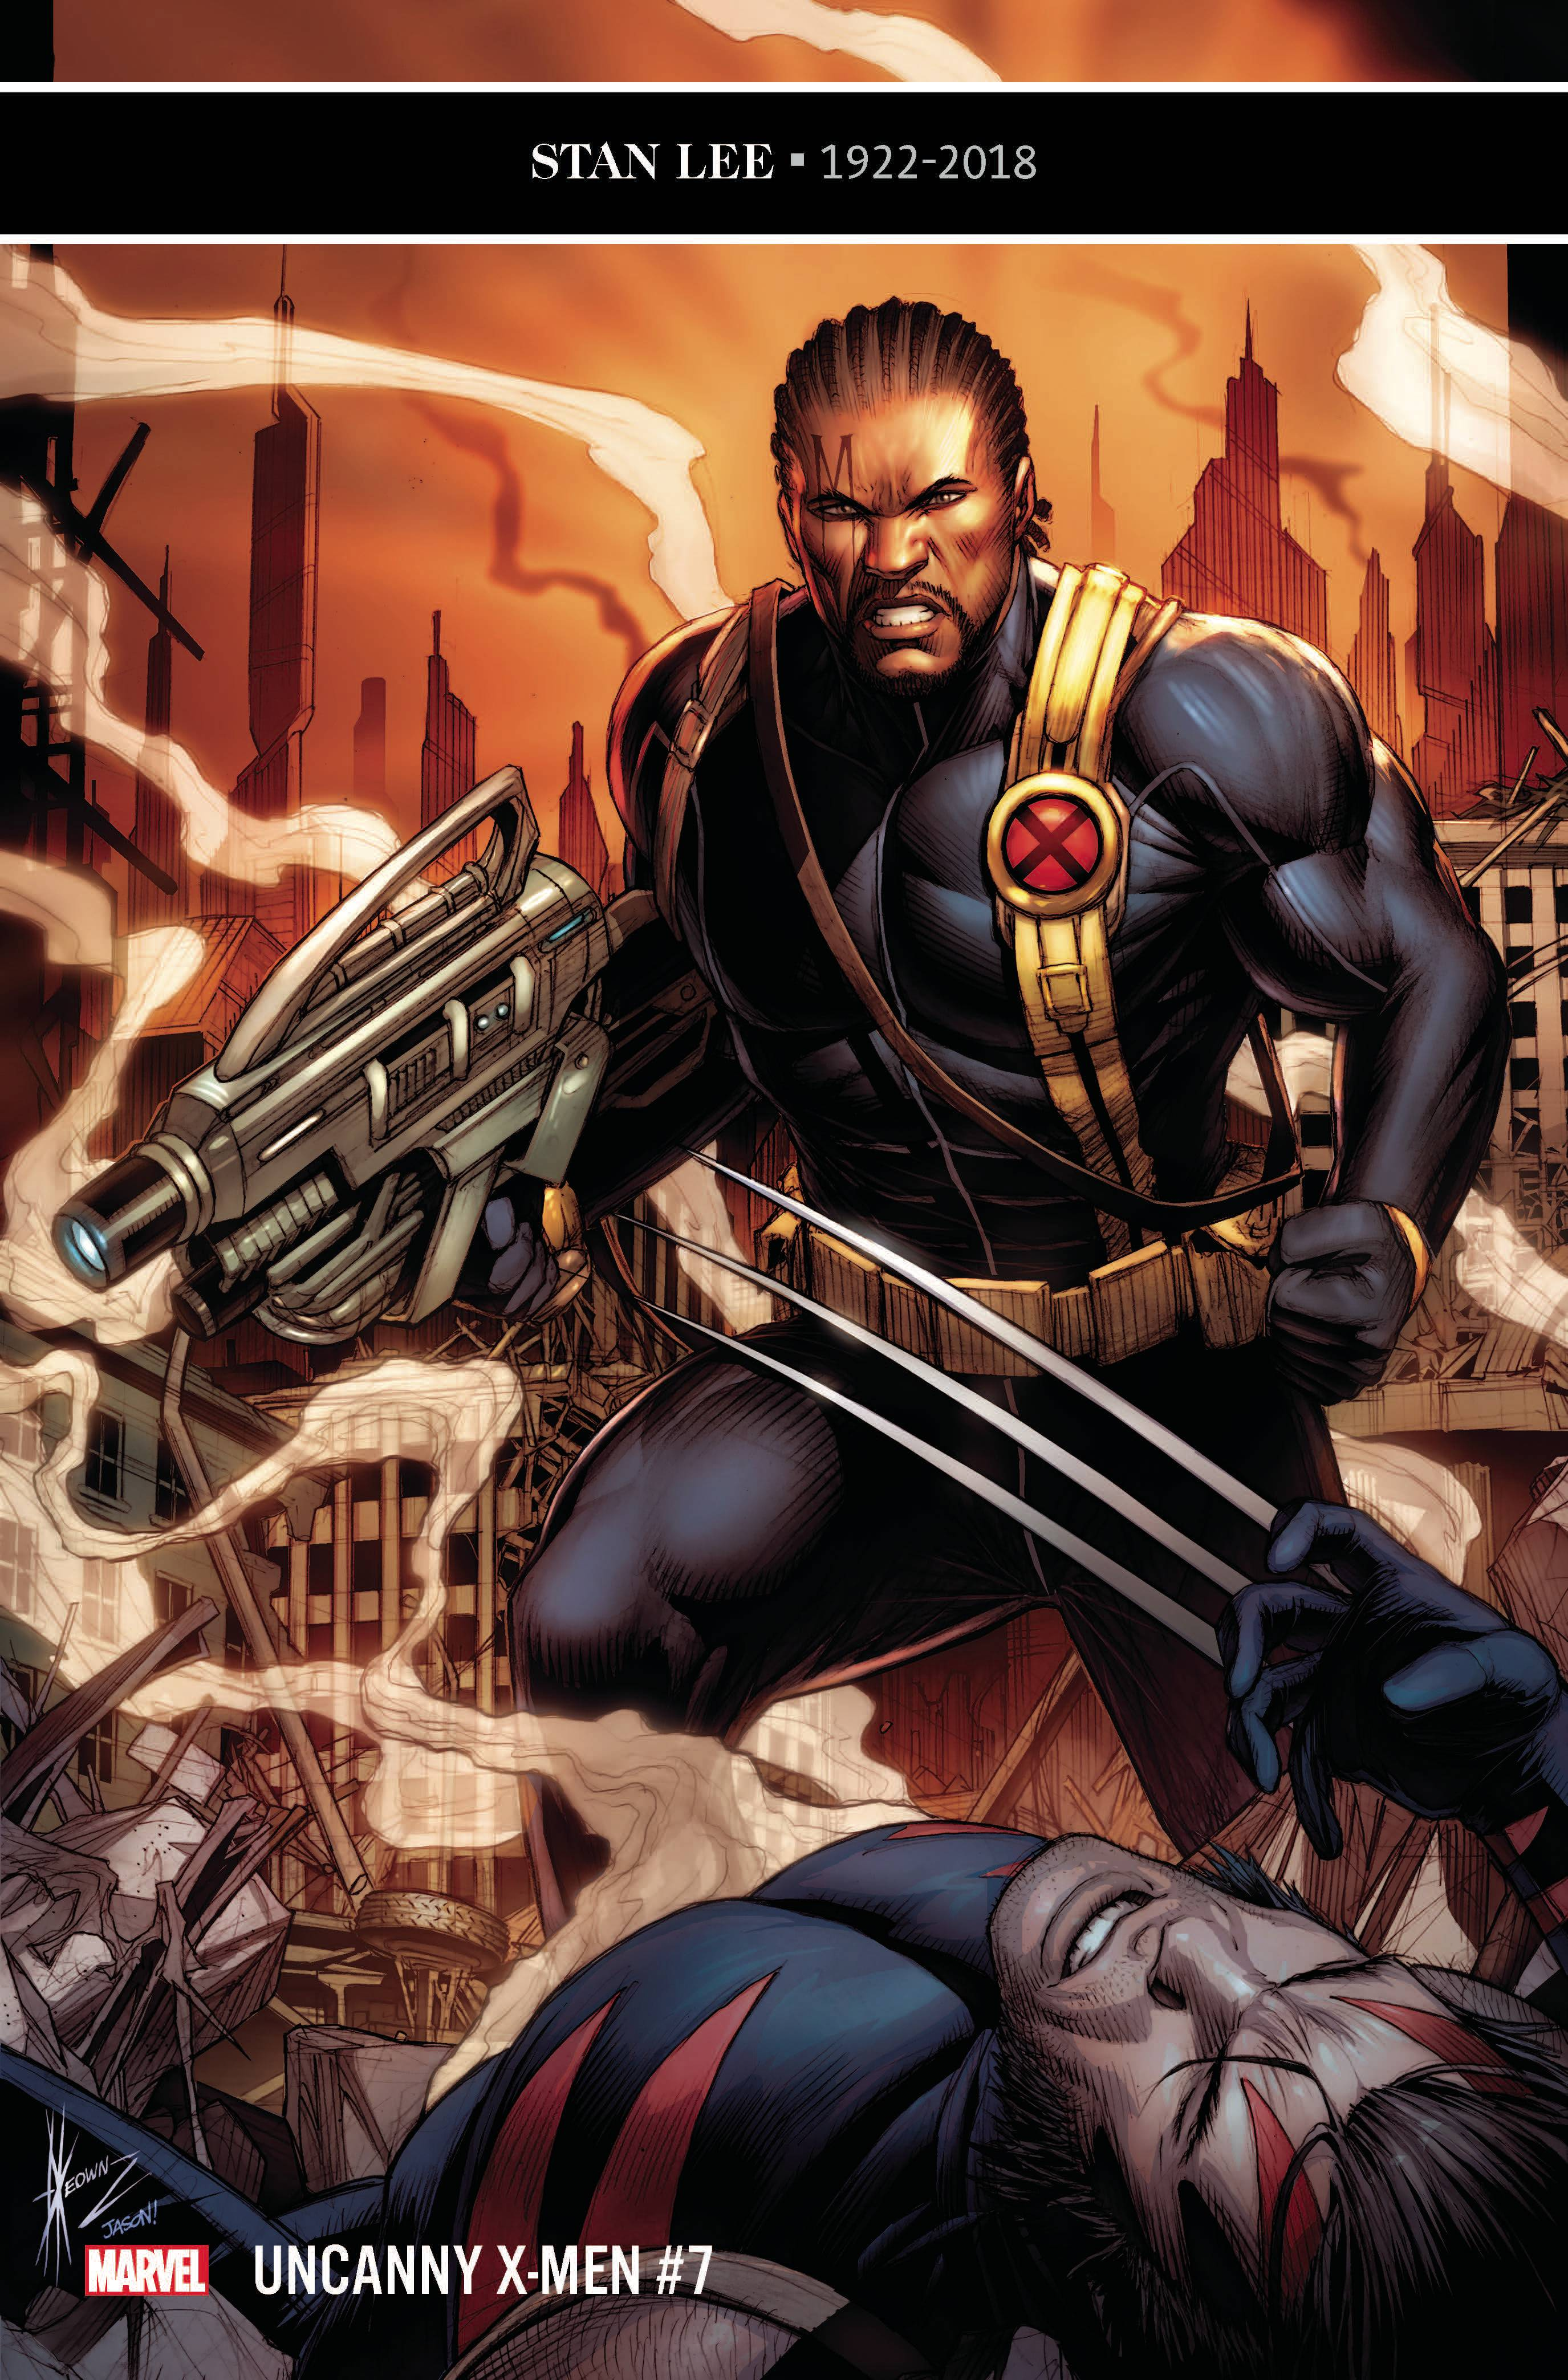 UNCANNY X-MEN #7 VARIANT PERE PEREZ COVER (1 in 25 copies)